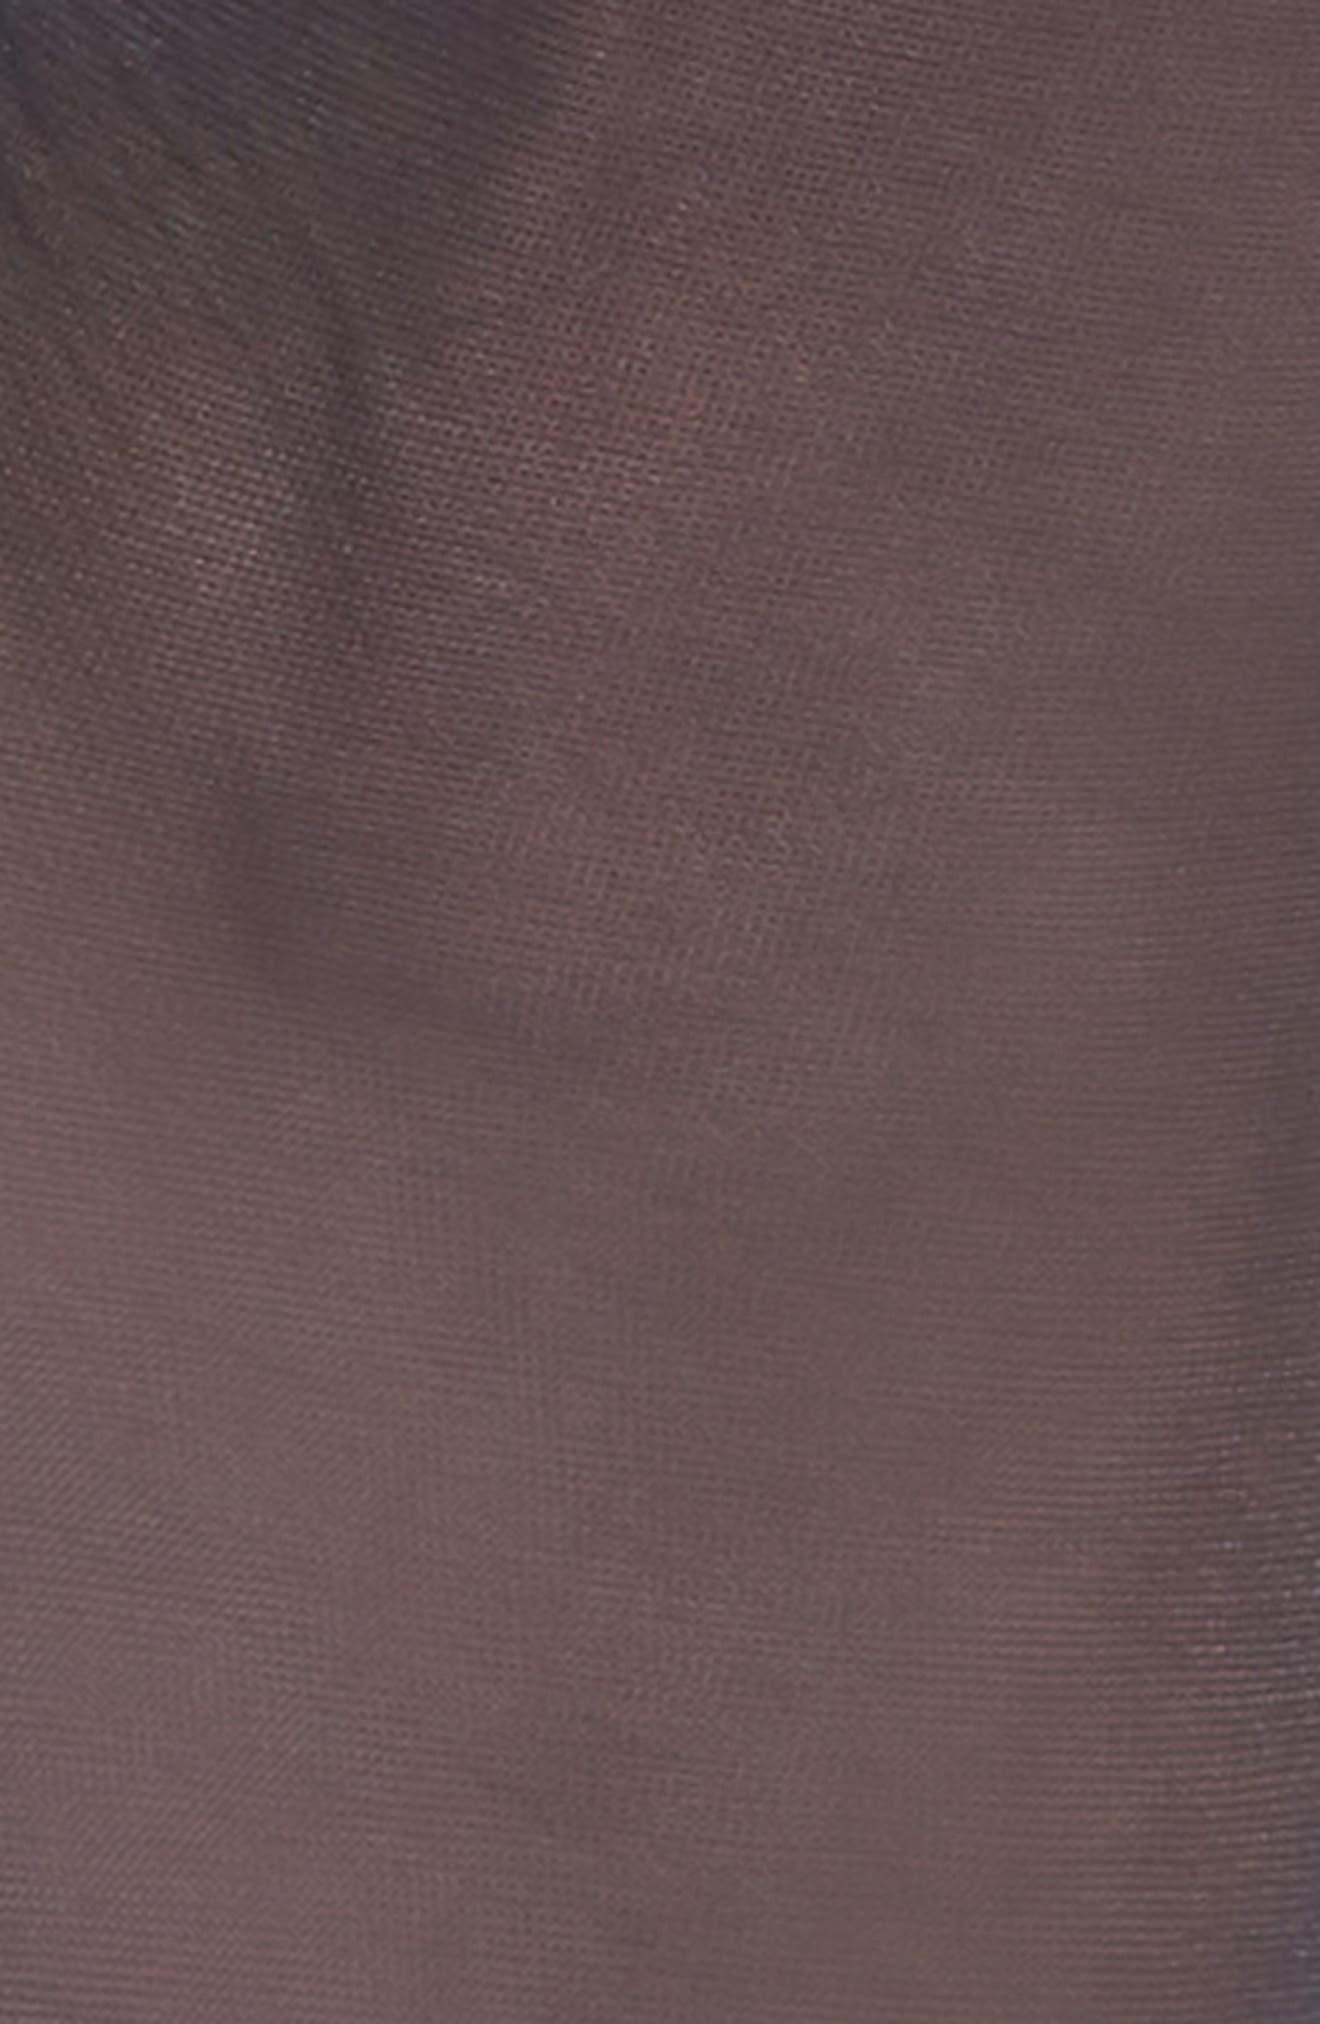 Patrizia Lace-Up Socks,                             Alternate thumbnail 3, color,                             Dark Blue